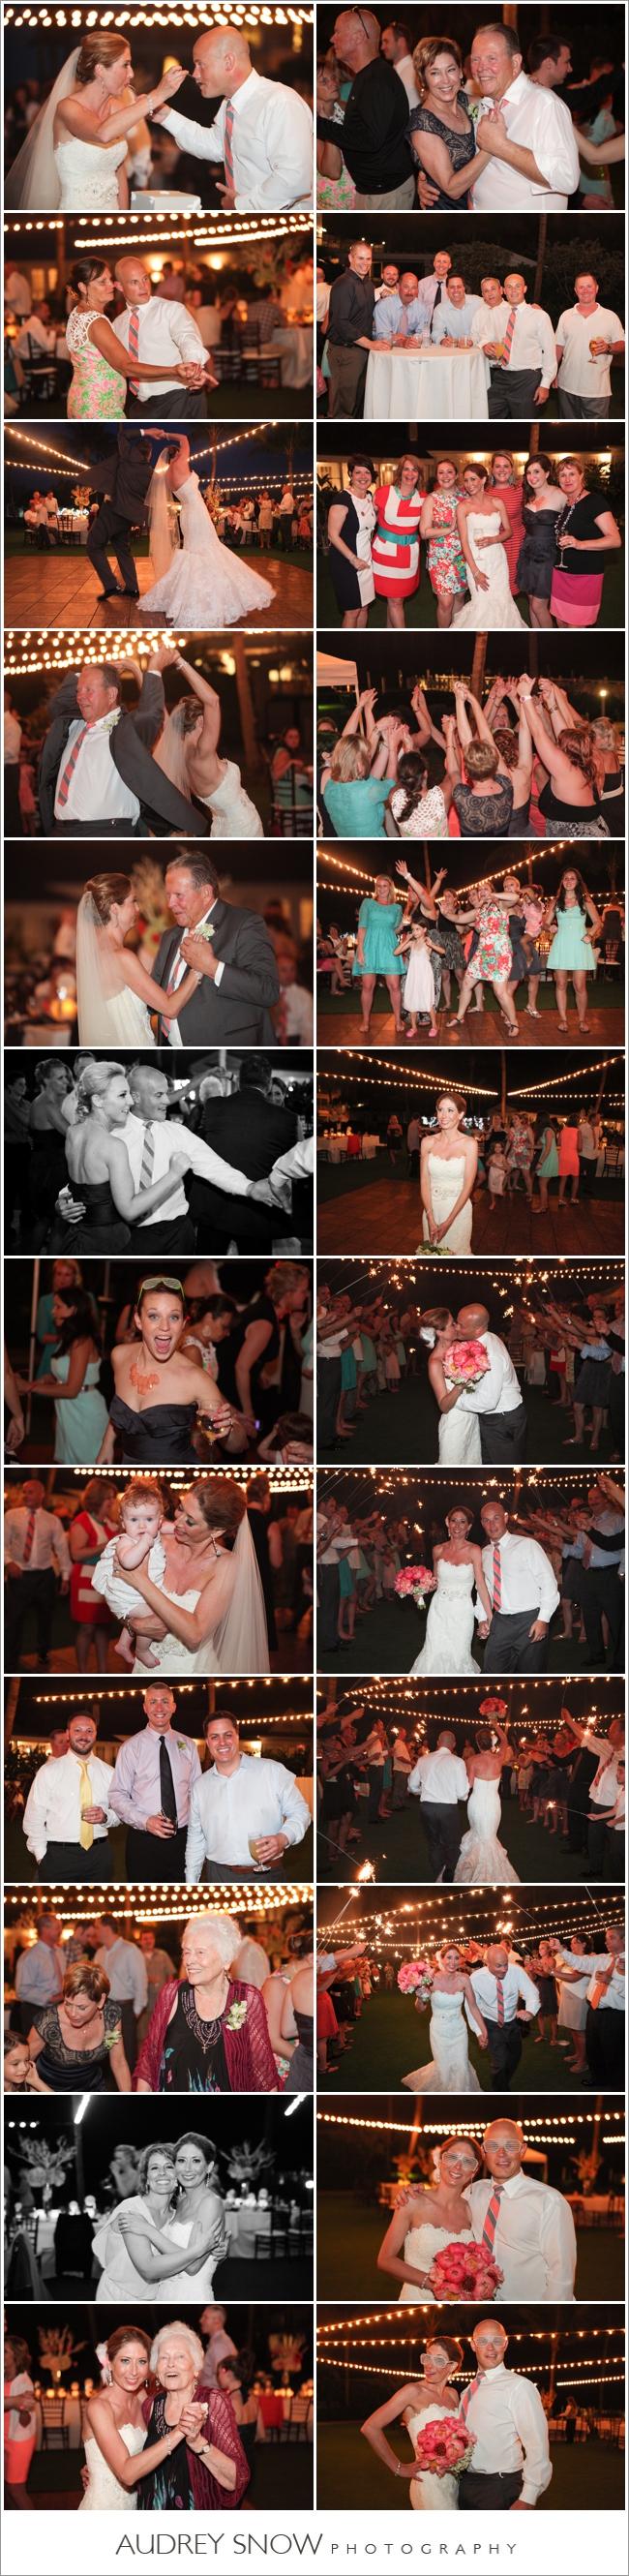 audreysnow-south-seas-captiva-wedding-photography_1047.jpg